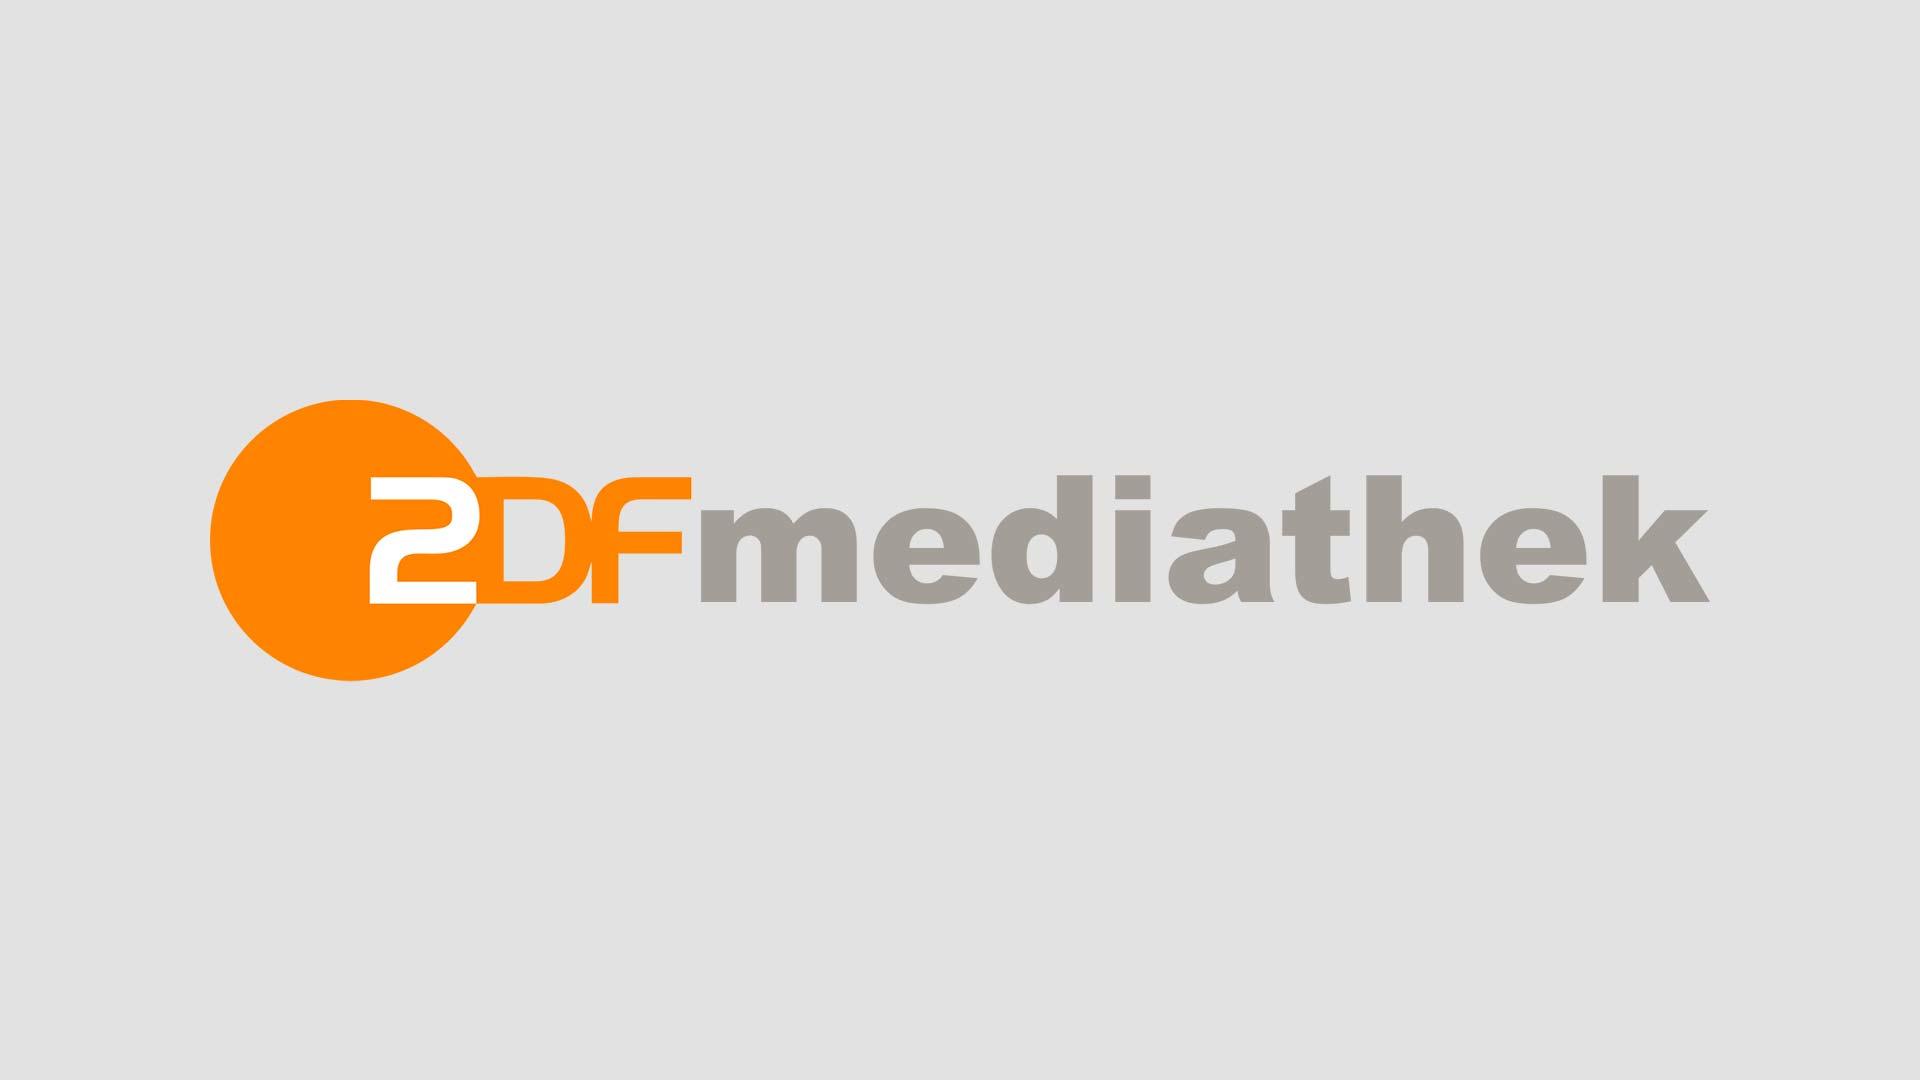 Zdf Mediathek The Fall